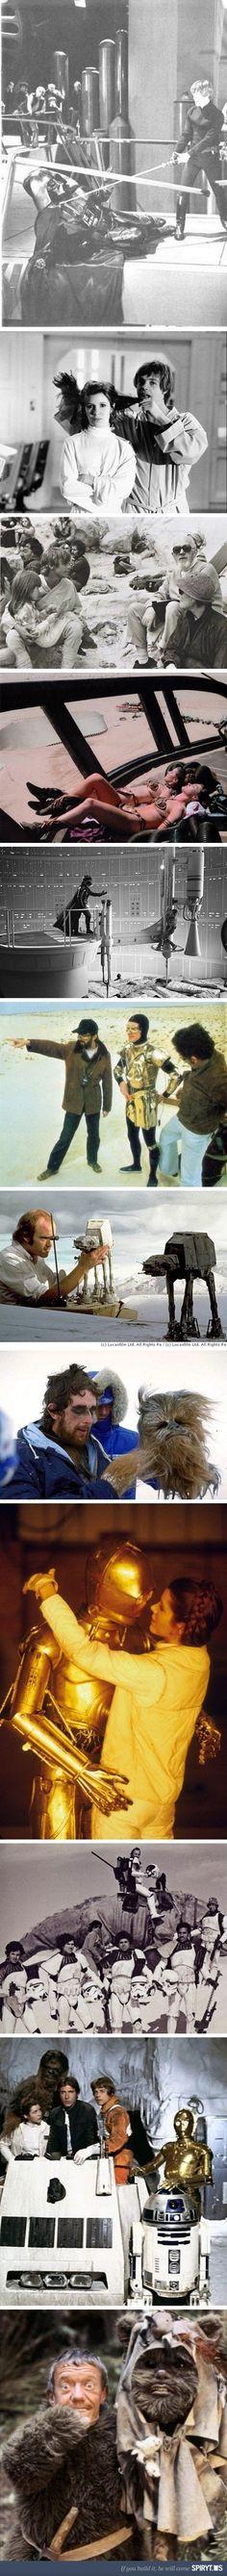 Great behind-the-scenes Star Wars shots